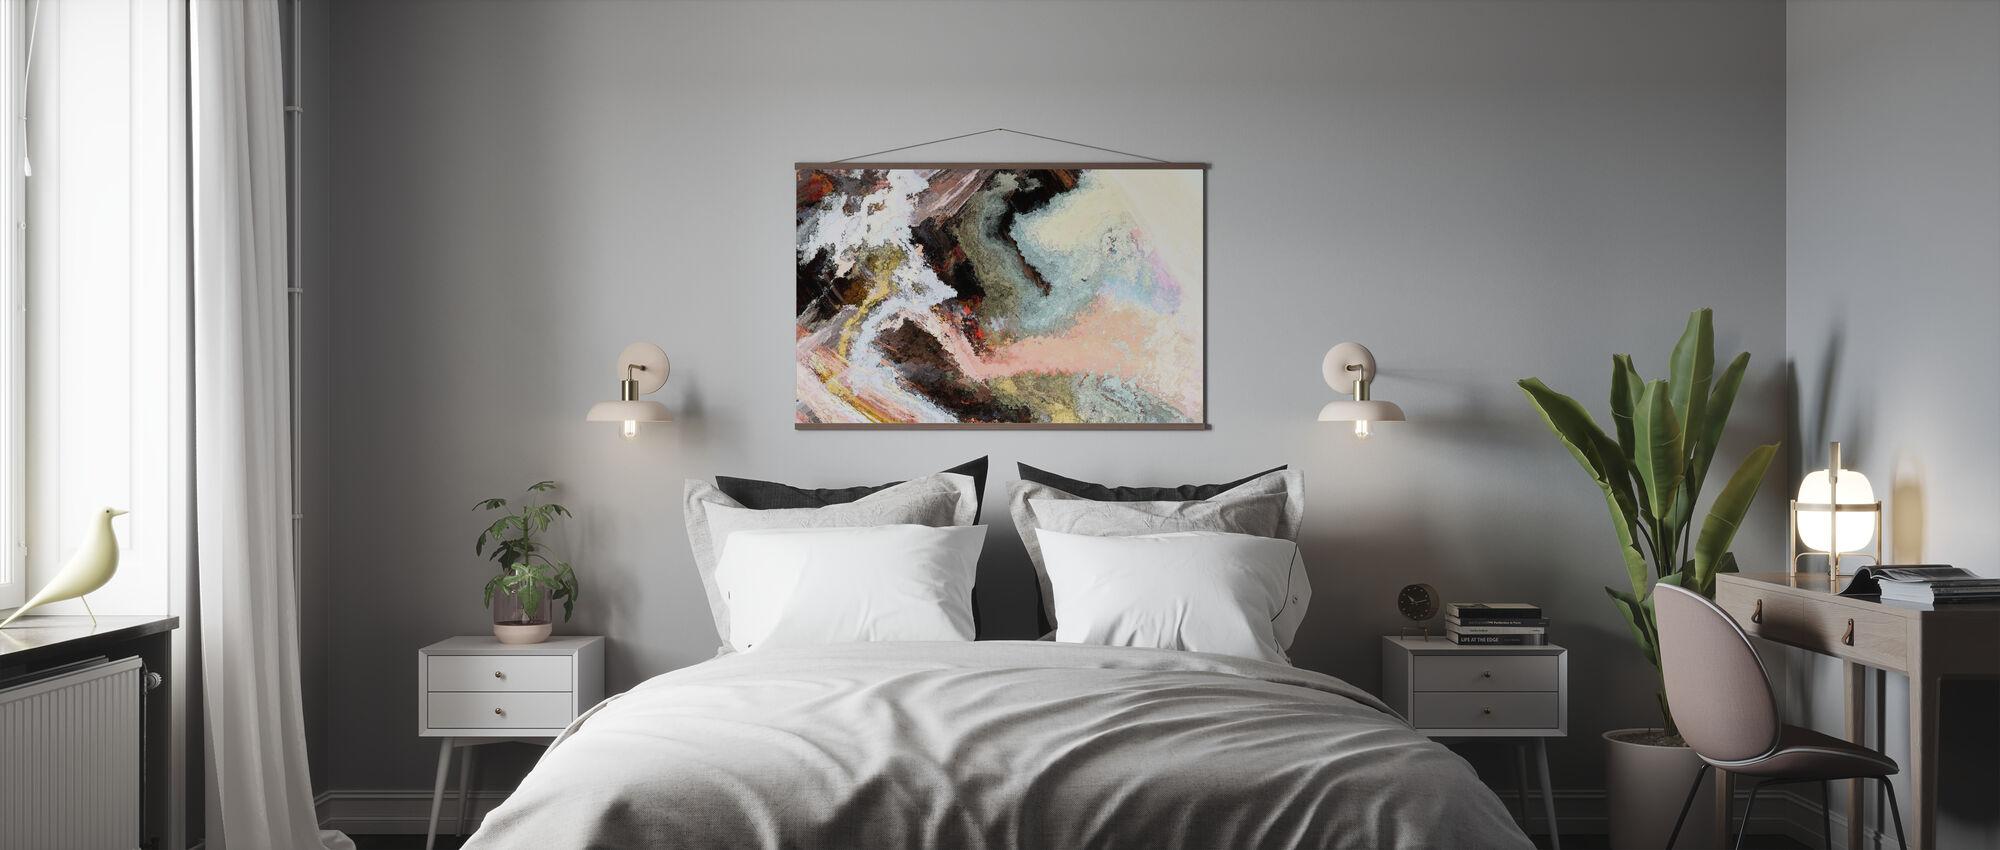 Strata - Poster - Bedroom